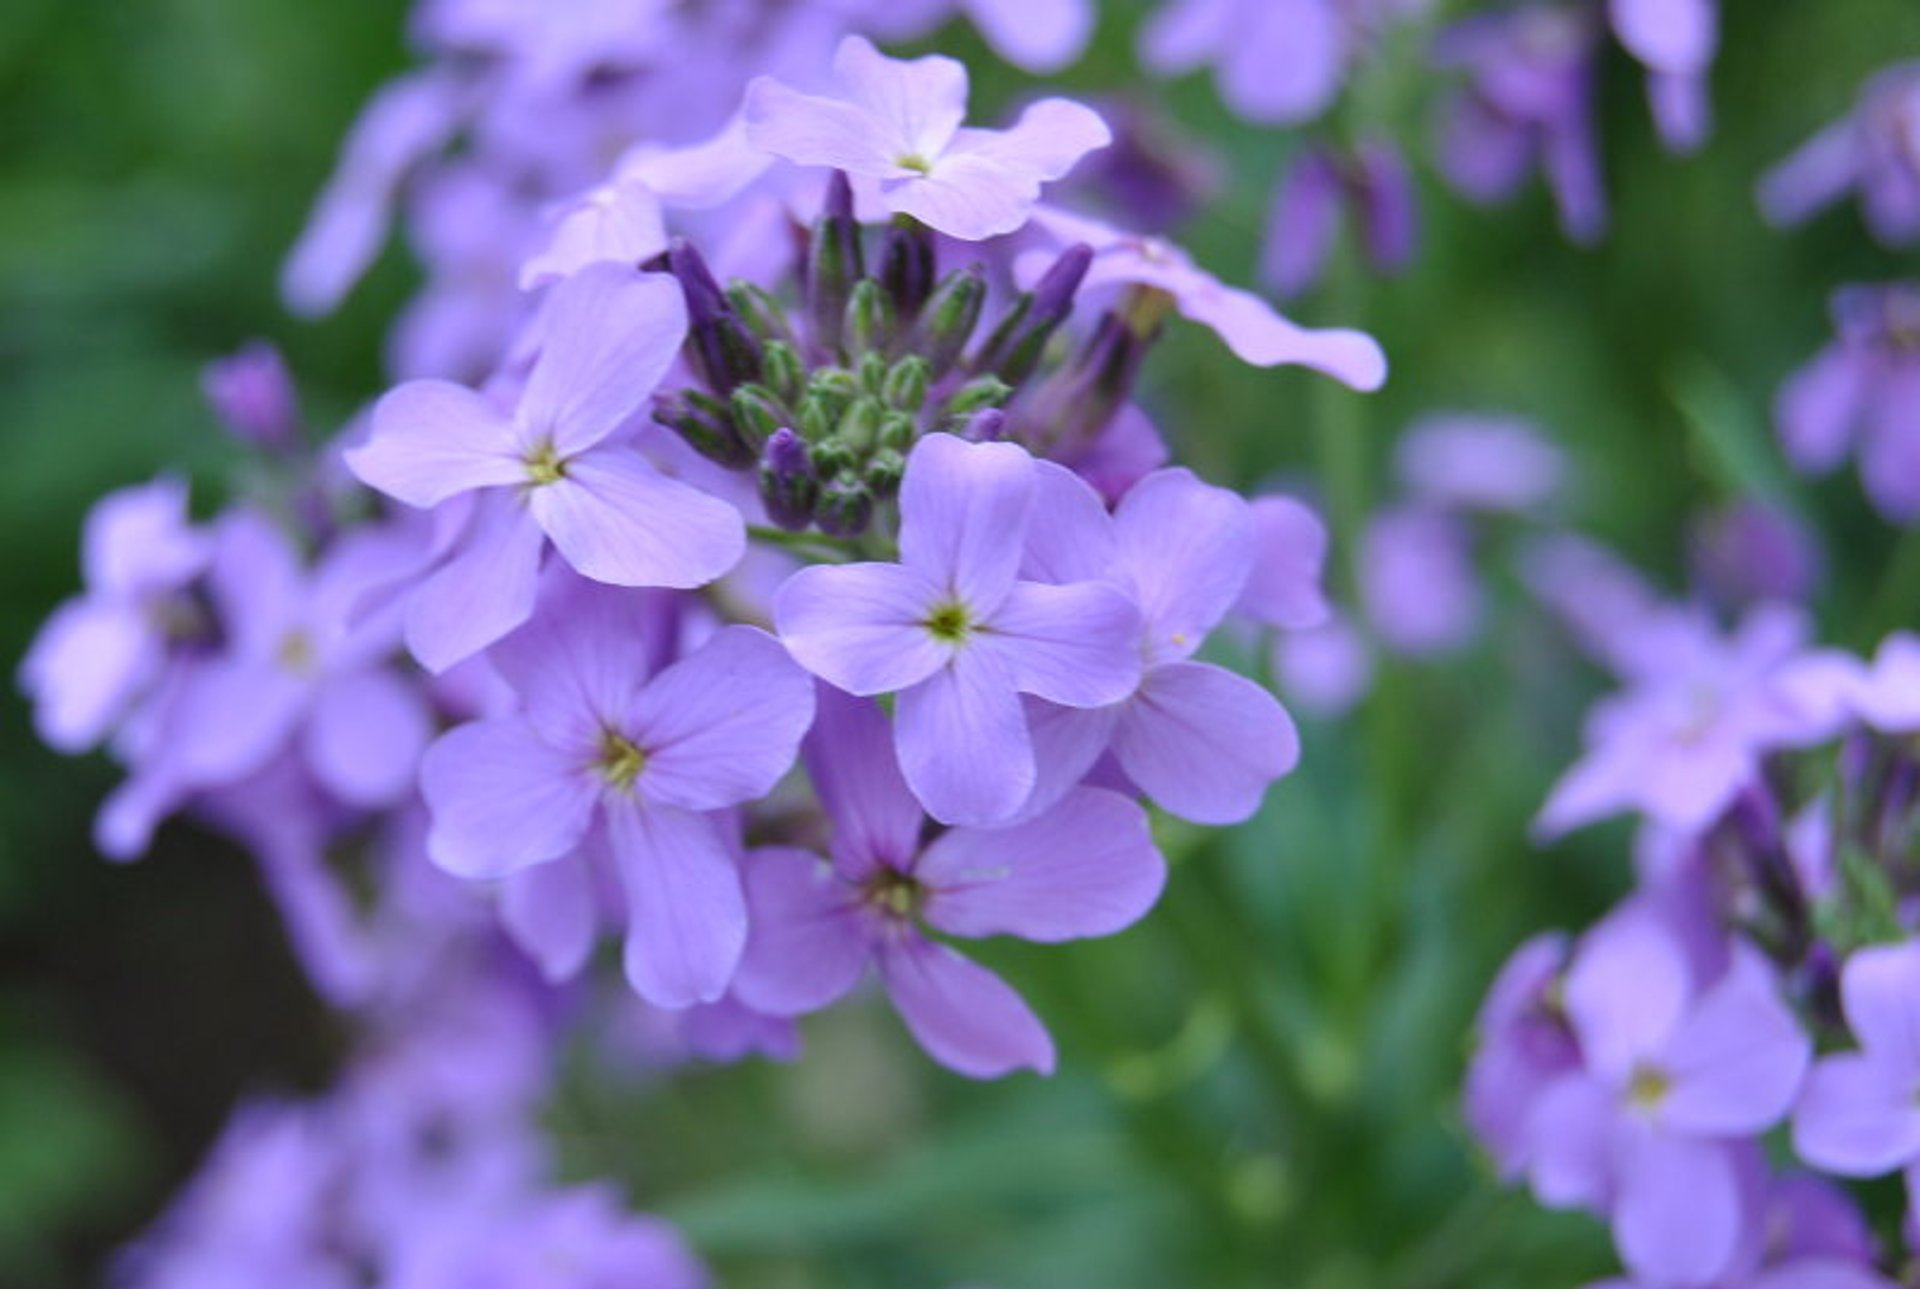 Flowers in Braxton County, West Virginia 2020